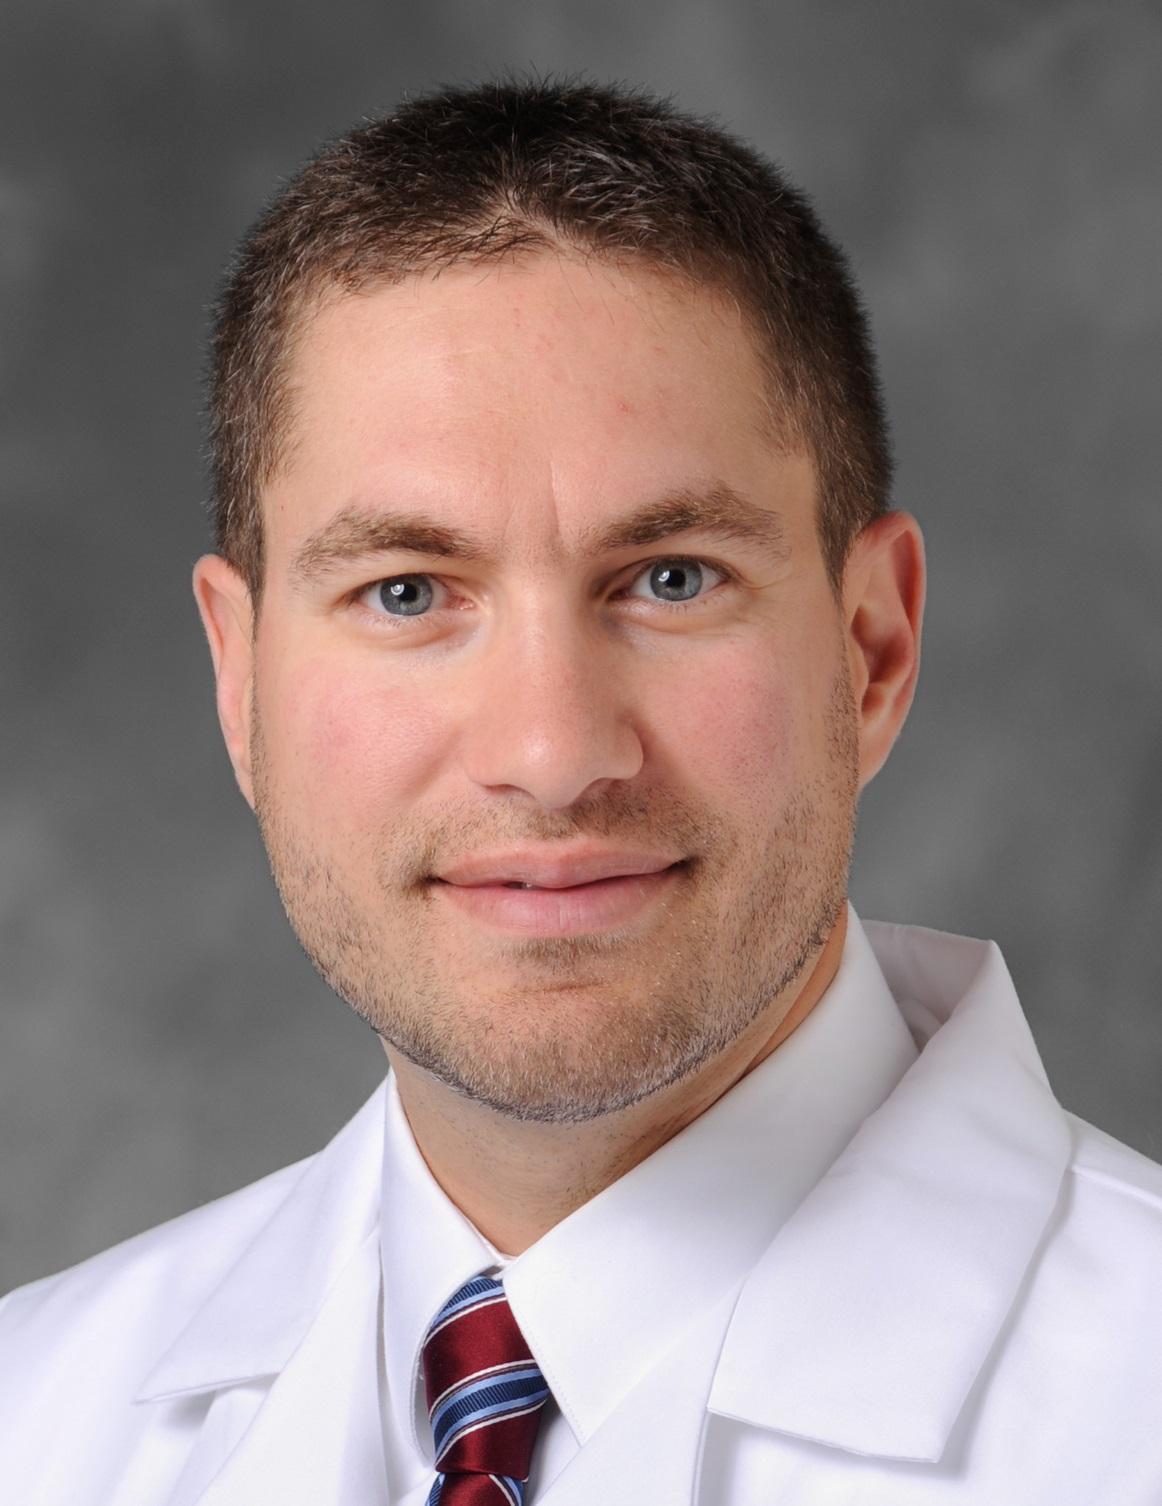 Clinical Associate Professor Stanford University School of Medicine  Medical Director, Radiology Informatics Lucile Packard Children's Hospital at Stanford